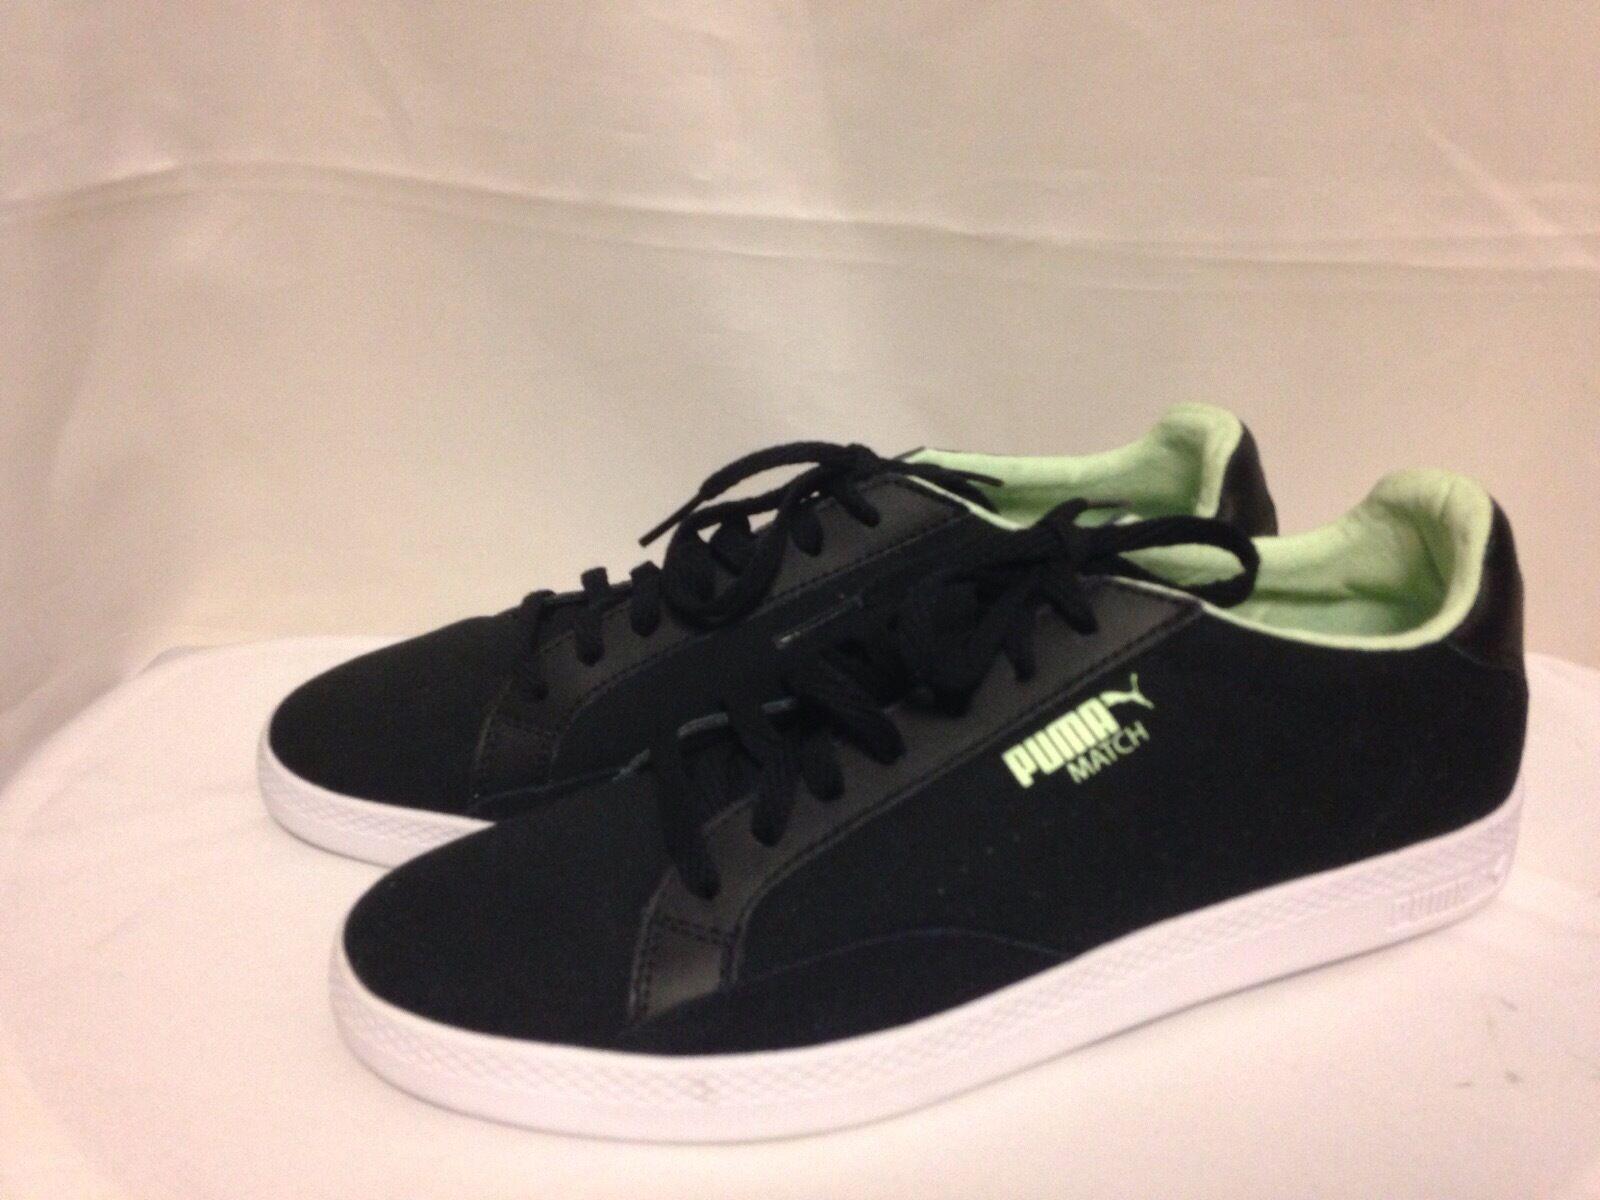 Puma Match Lo Factory Sneaker 9.5 M Black/Mint  New w/ Box best-selling model of the brand